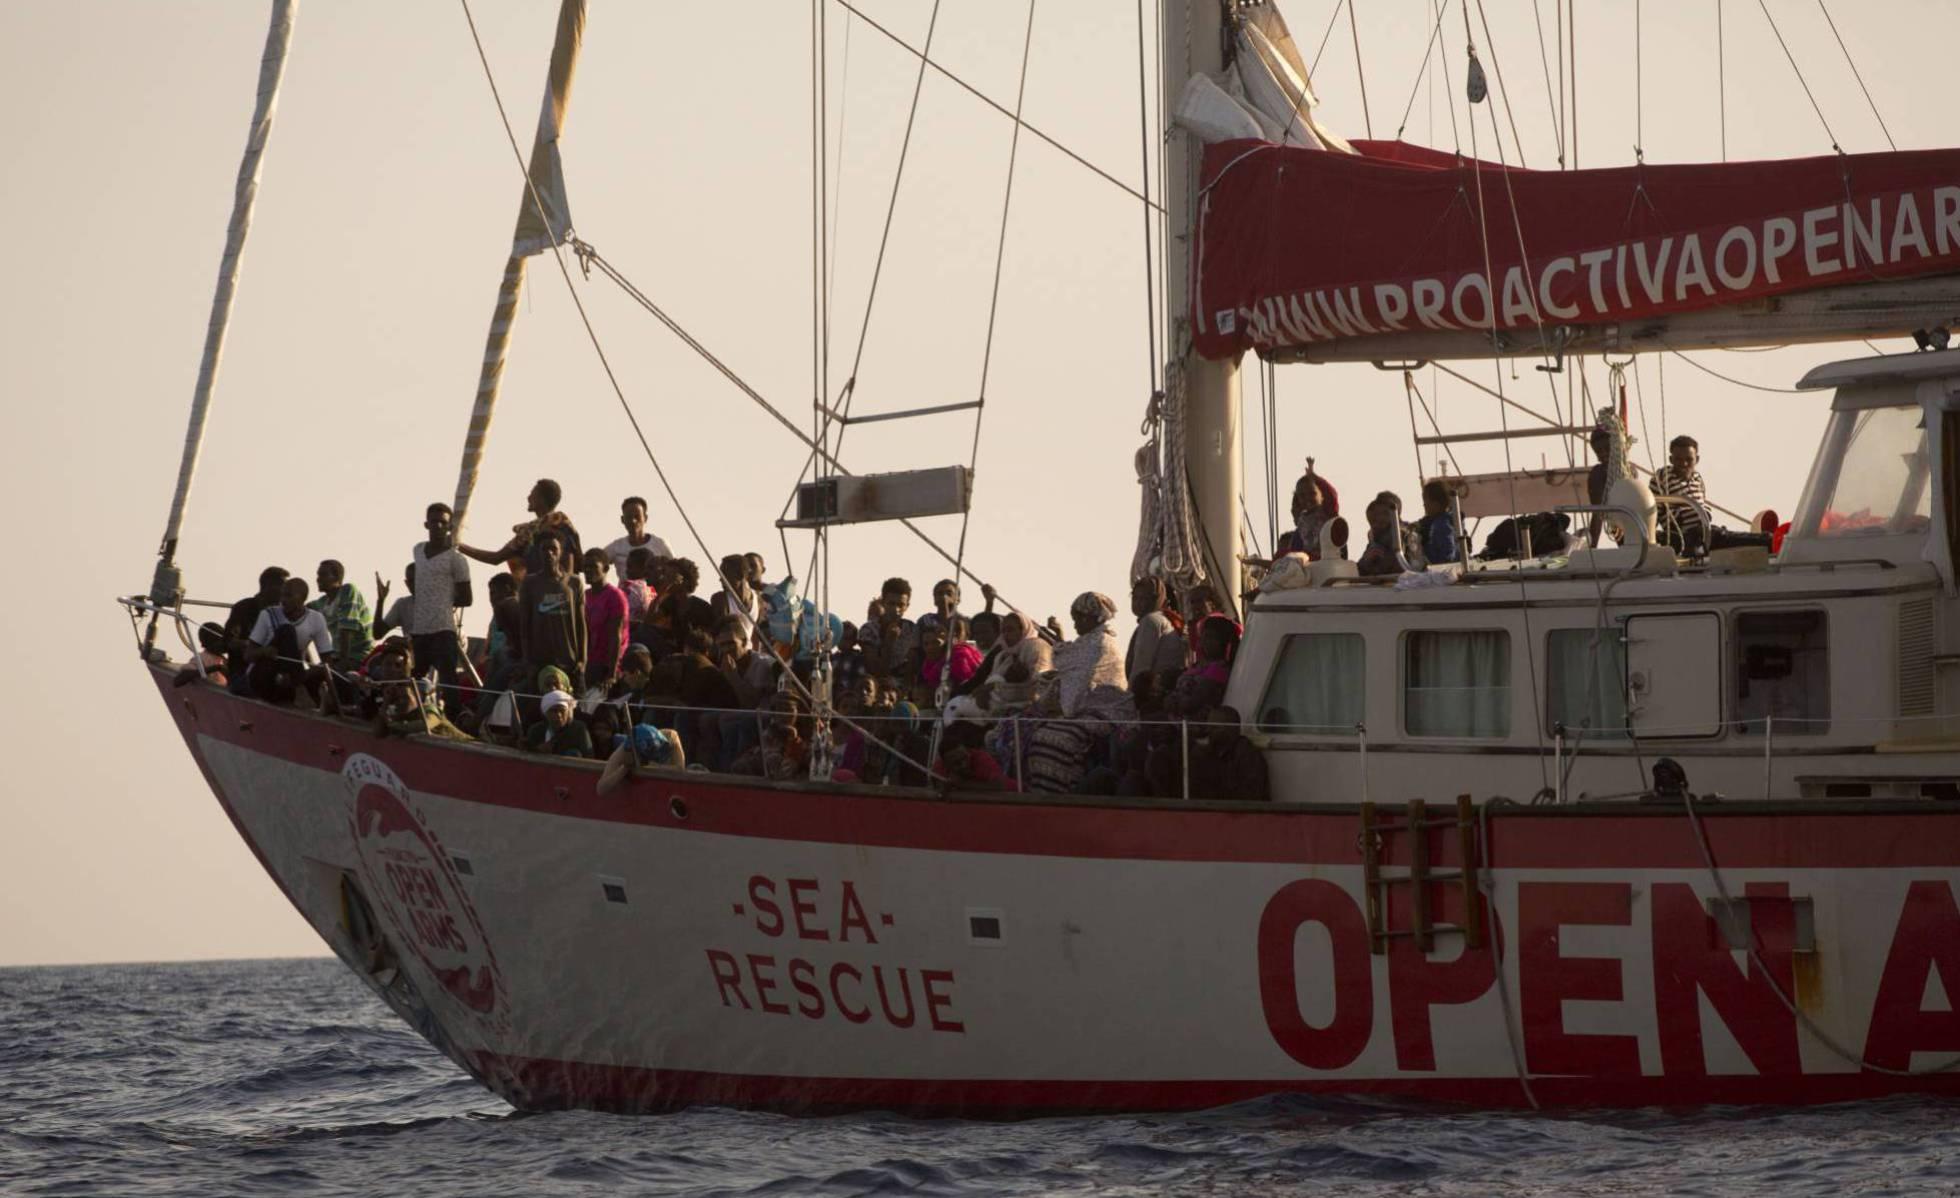 Rescue ship-Spain